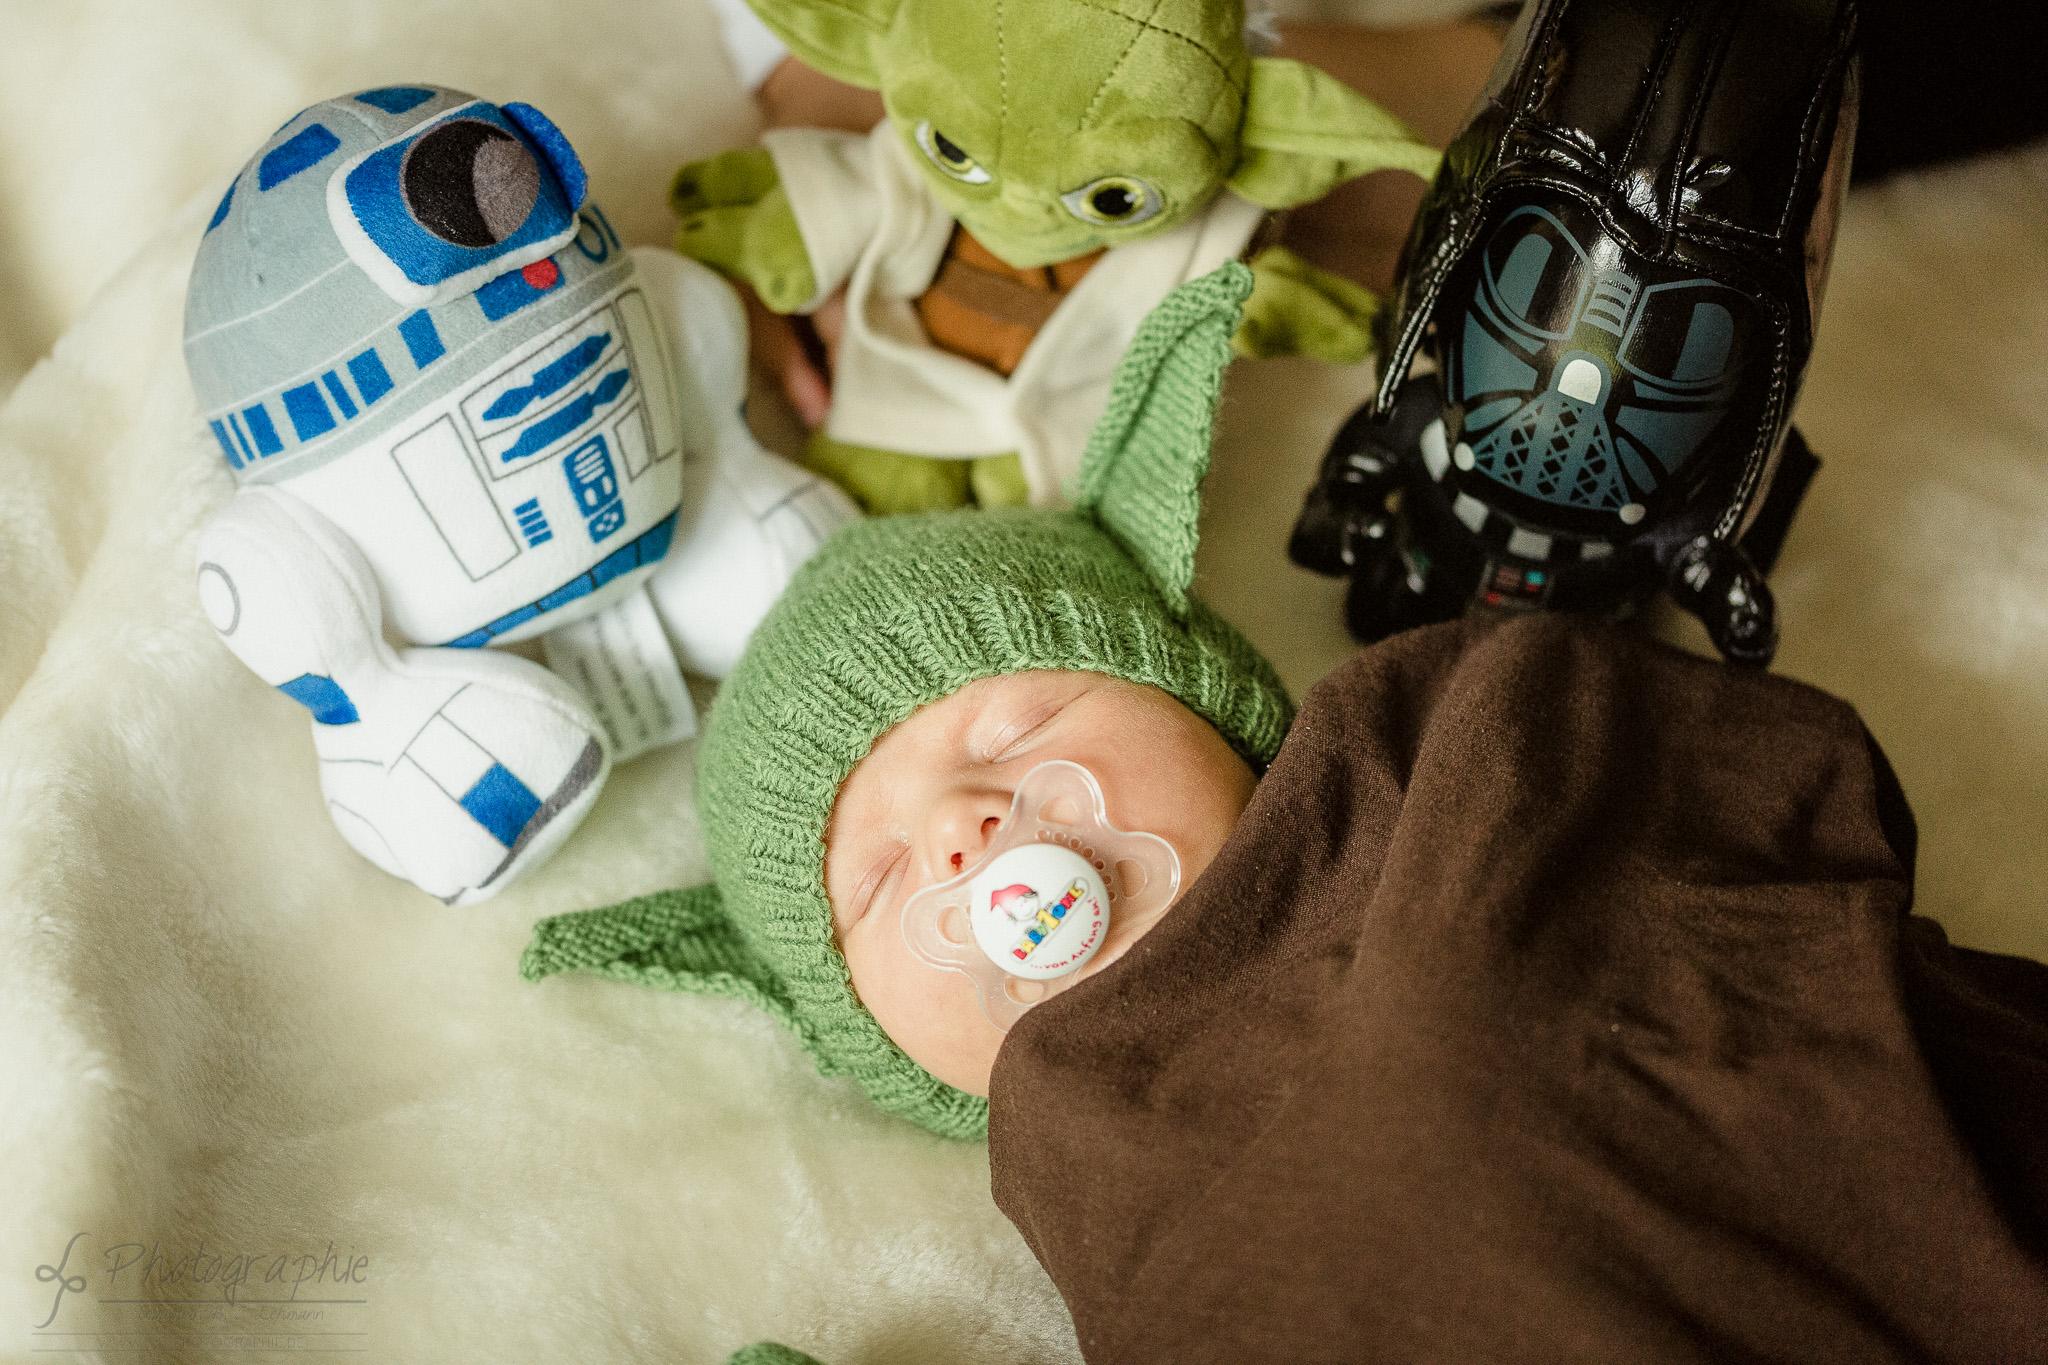 Familienfotograf - Neugeborenenfotografie - Star Wars - Träumen Du musst junger Padawan